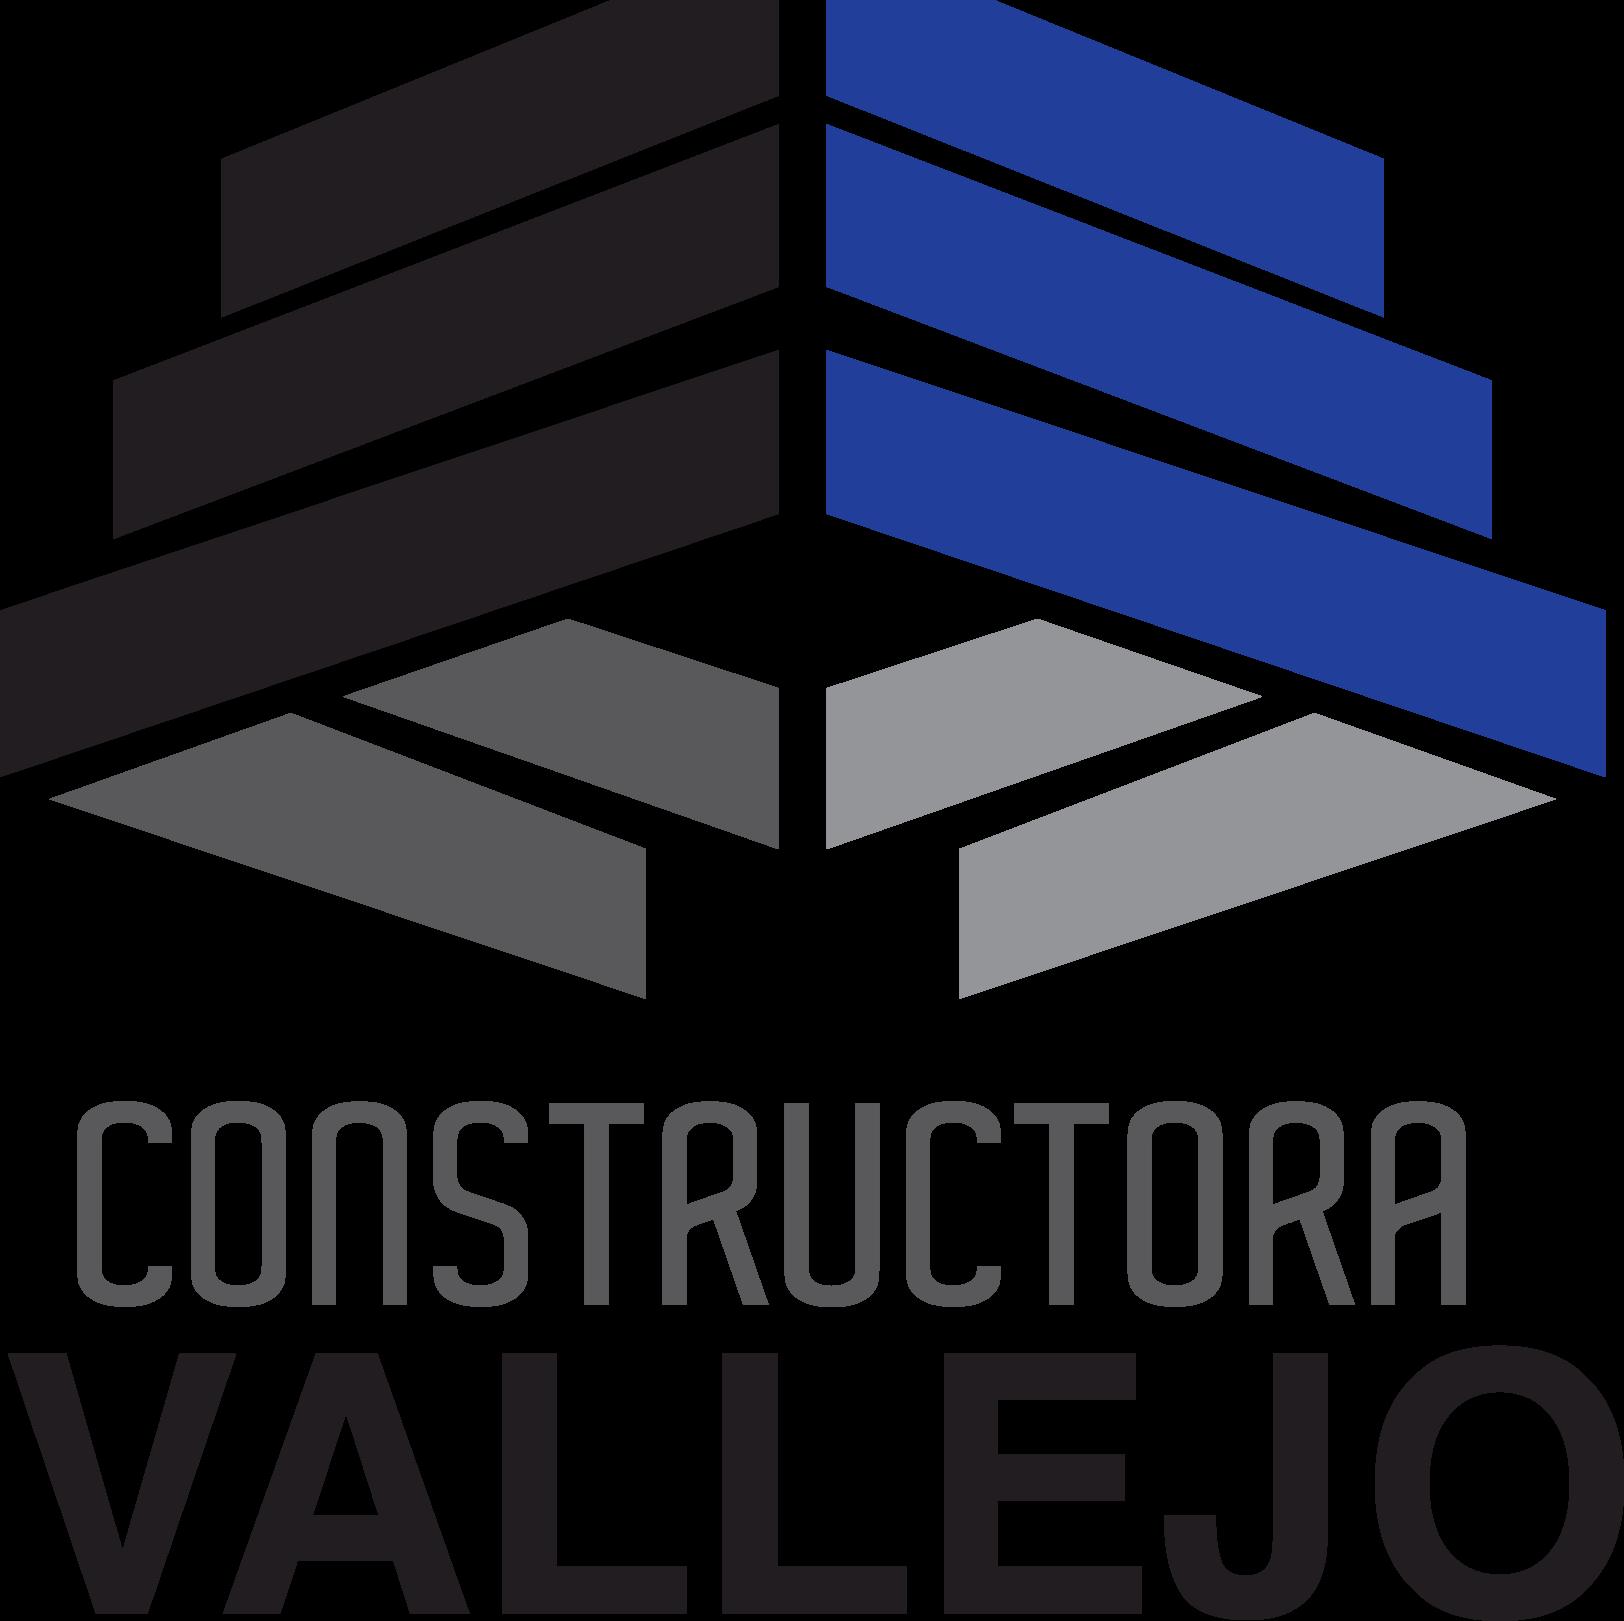 Constructora vallejo consvallejo twitter for Constructora